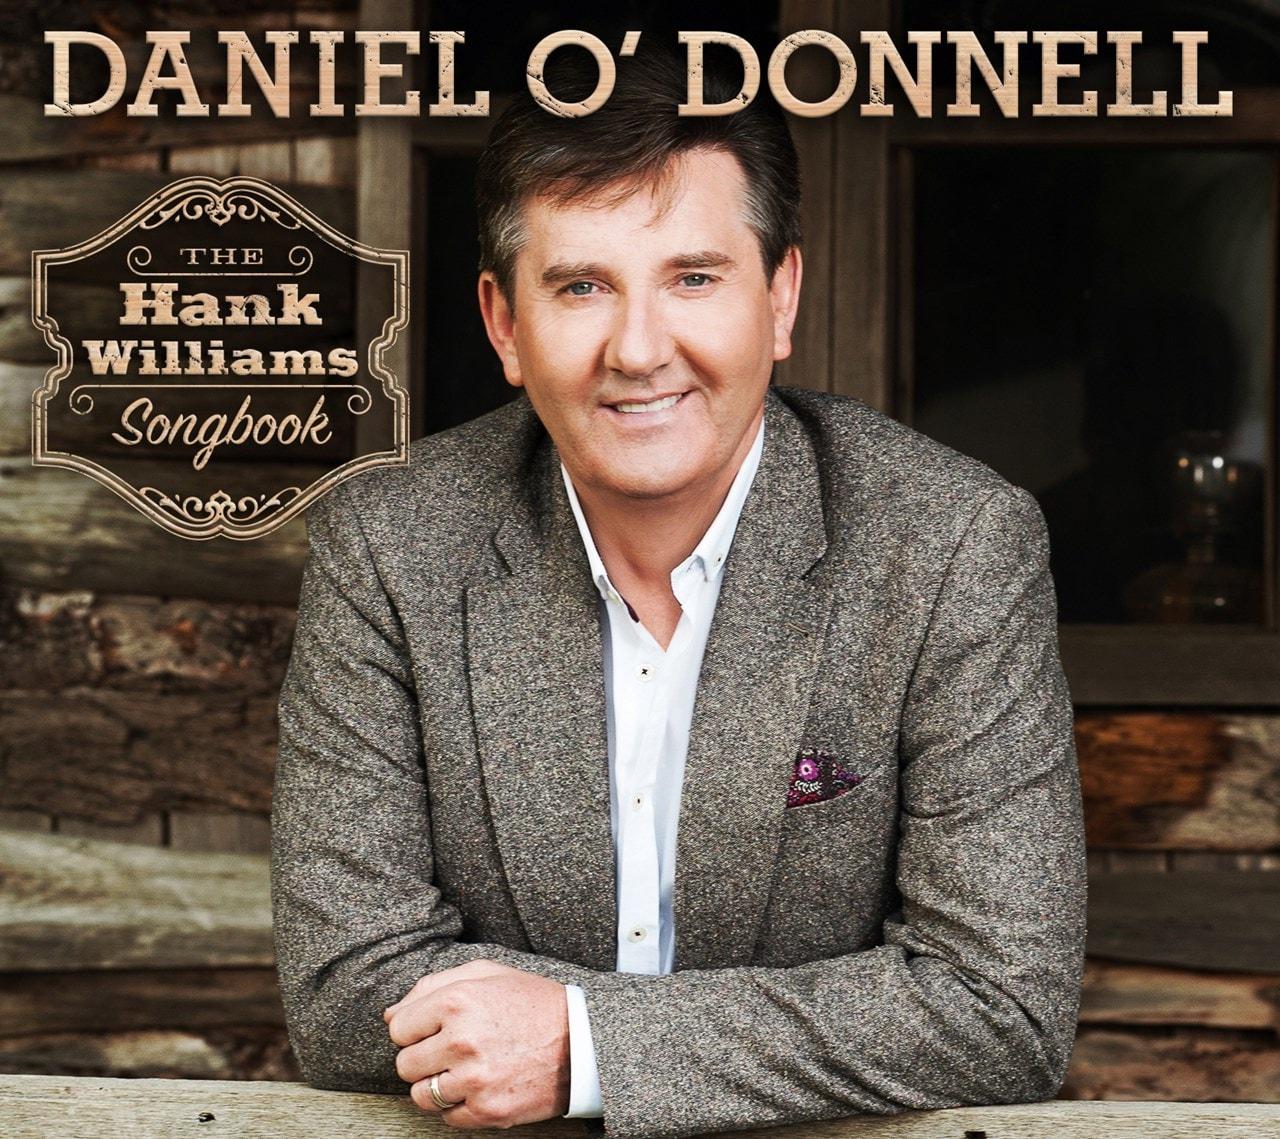 The Hank Williams Songbook - 1